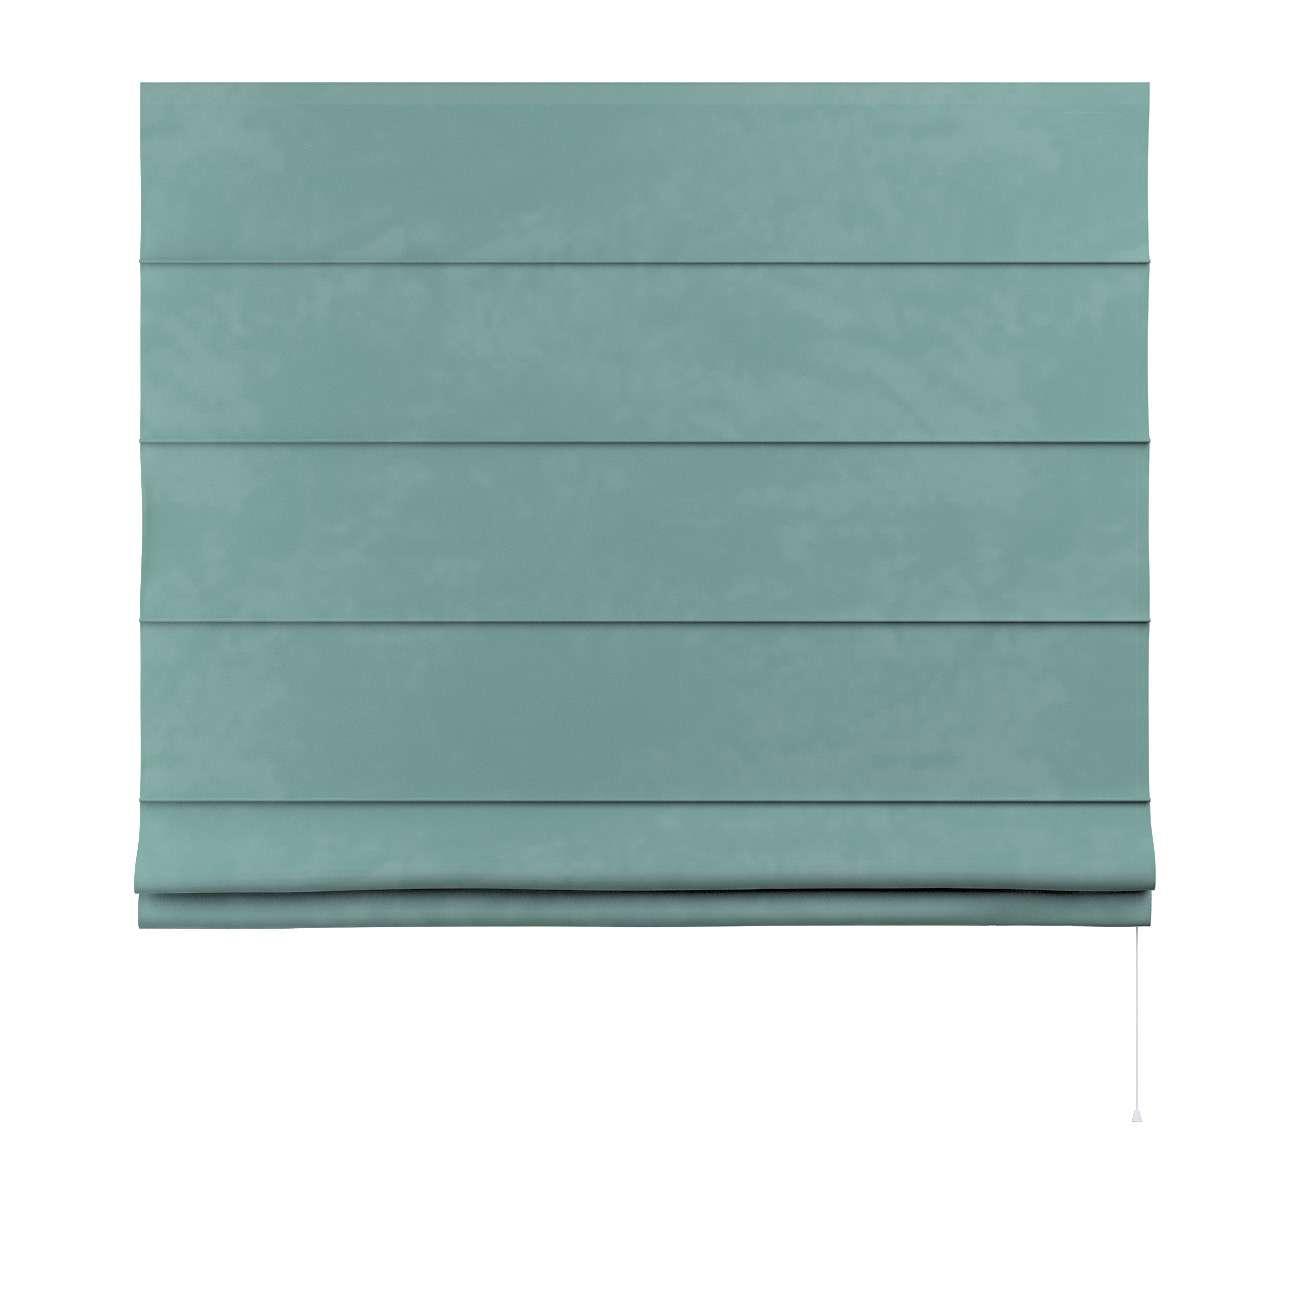 Rímska roleta Capri V kolekcii Velvet, tkanina: 704-18